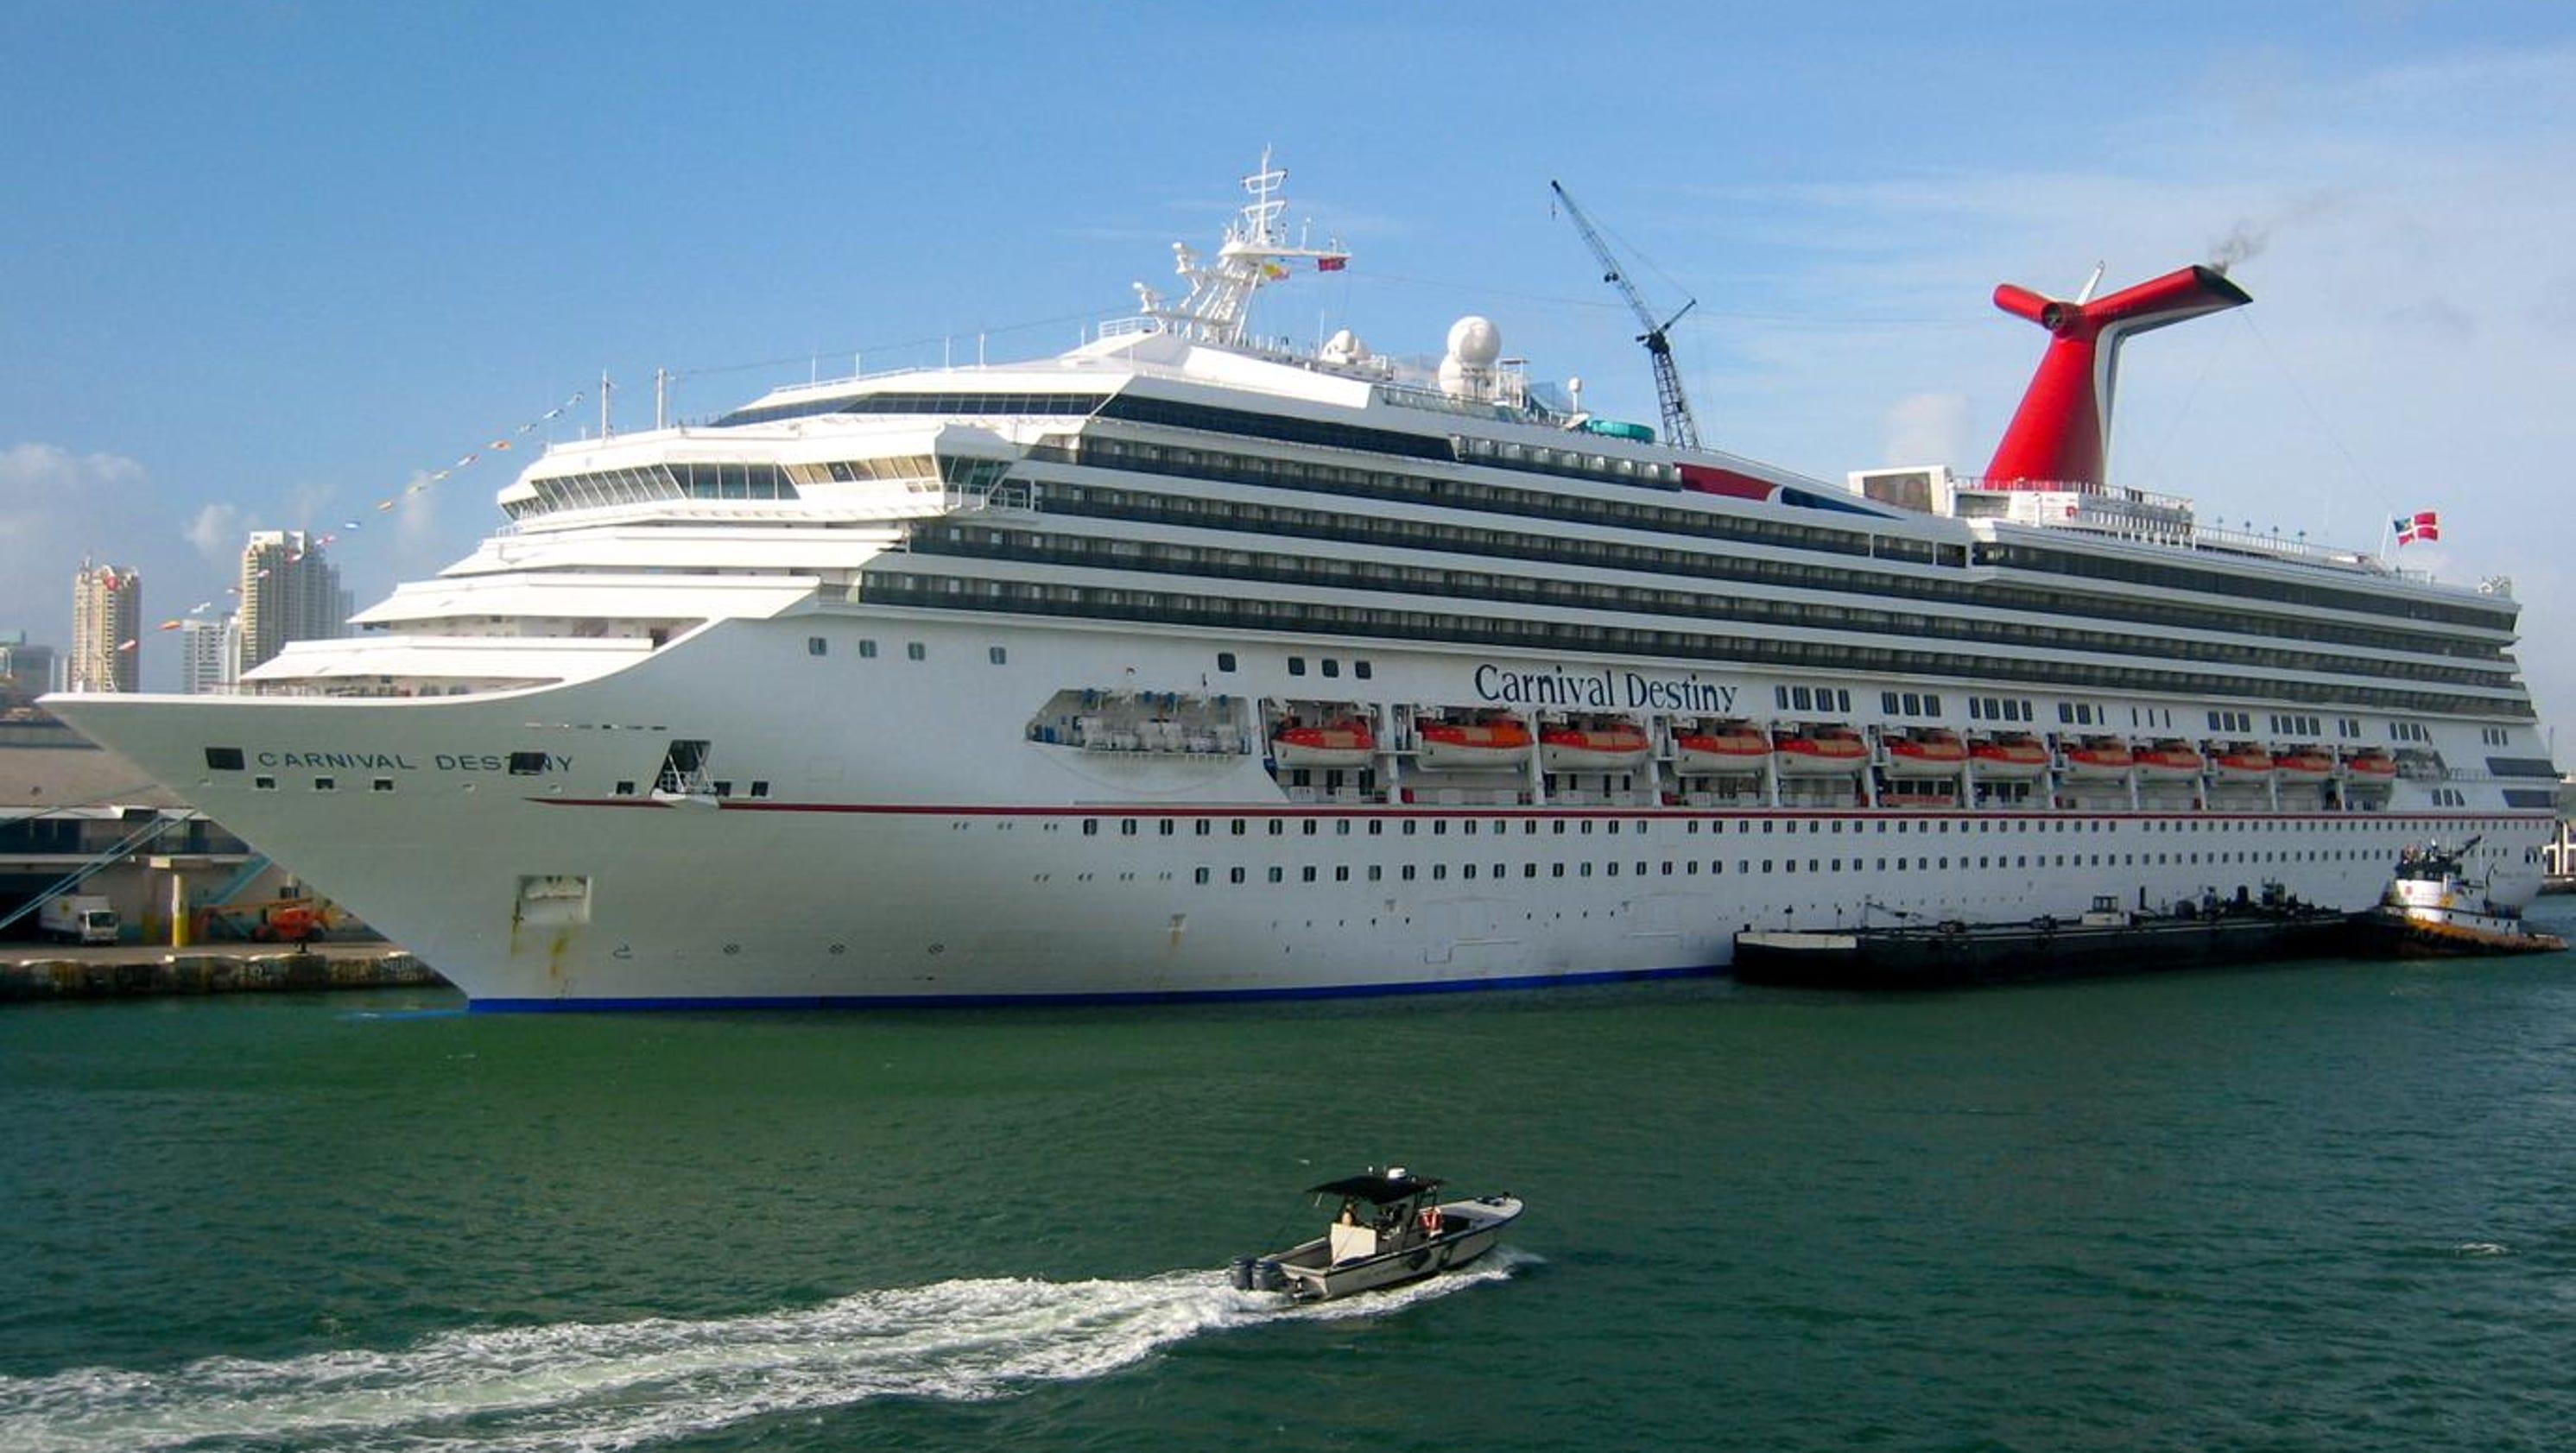 Cruise Ship Tours Carnival Destiny